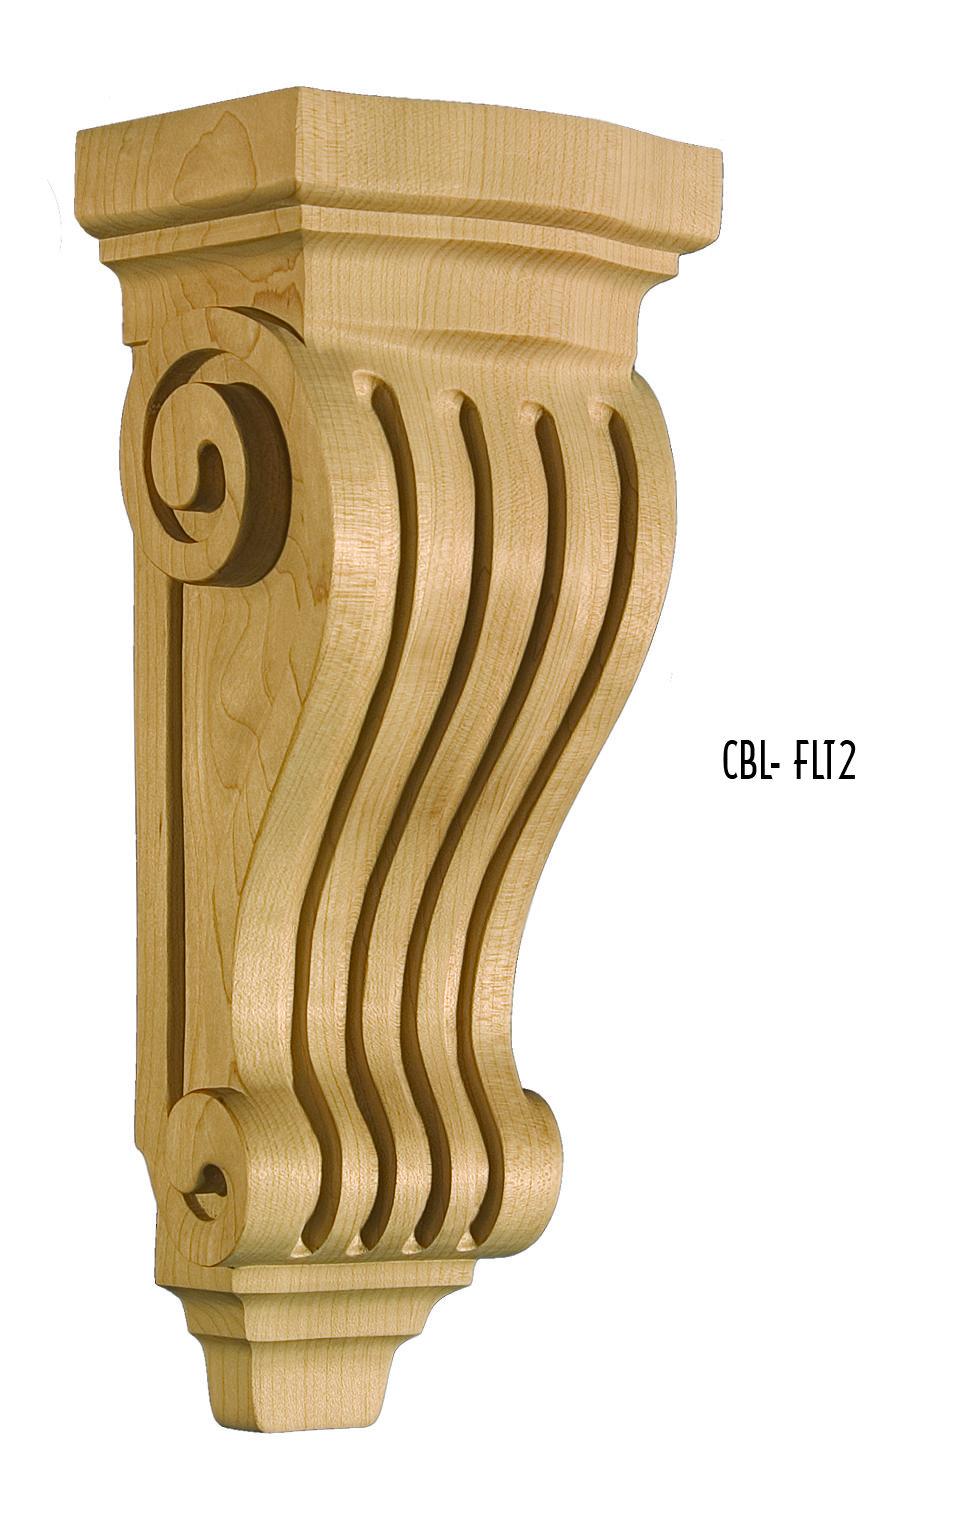 Cbl Flt2 Traditional Collection Wood Carving Designs Wood Appliques Antique Furniture Vintage